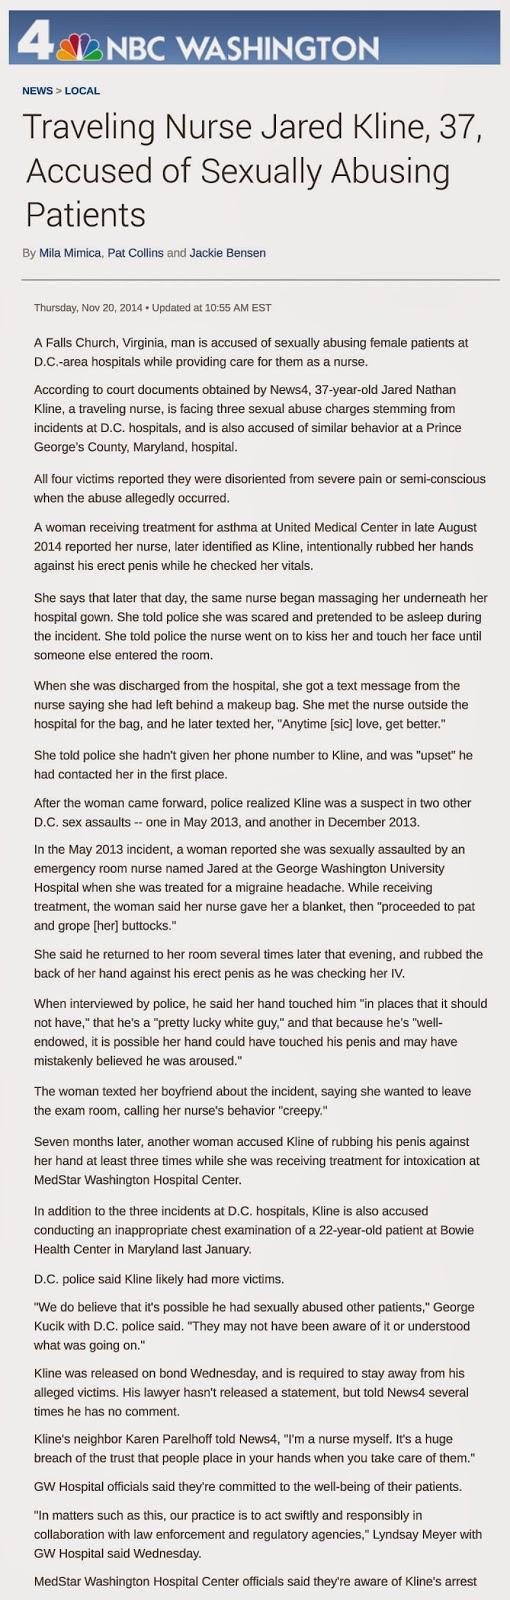 http://www.nbcwashington.com/news/local/Jared-Kline-Traveling-Nurse-DC-Area-Hospitals-Sex-Abuse-Patients-283246701.html